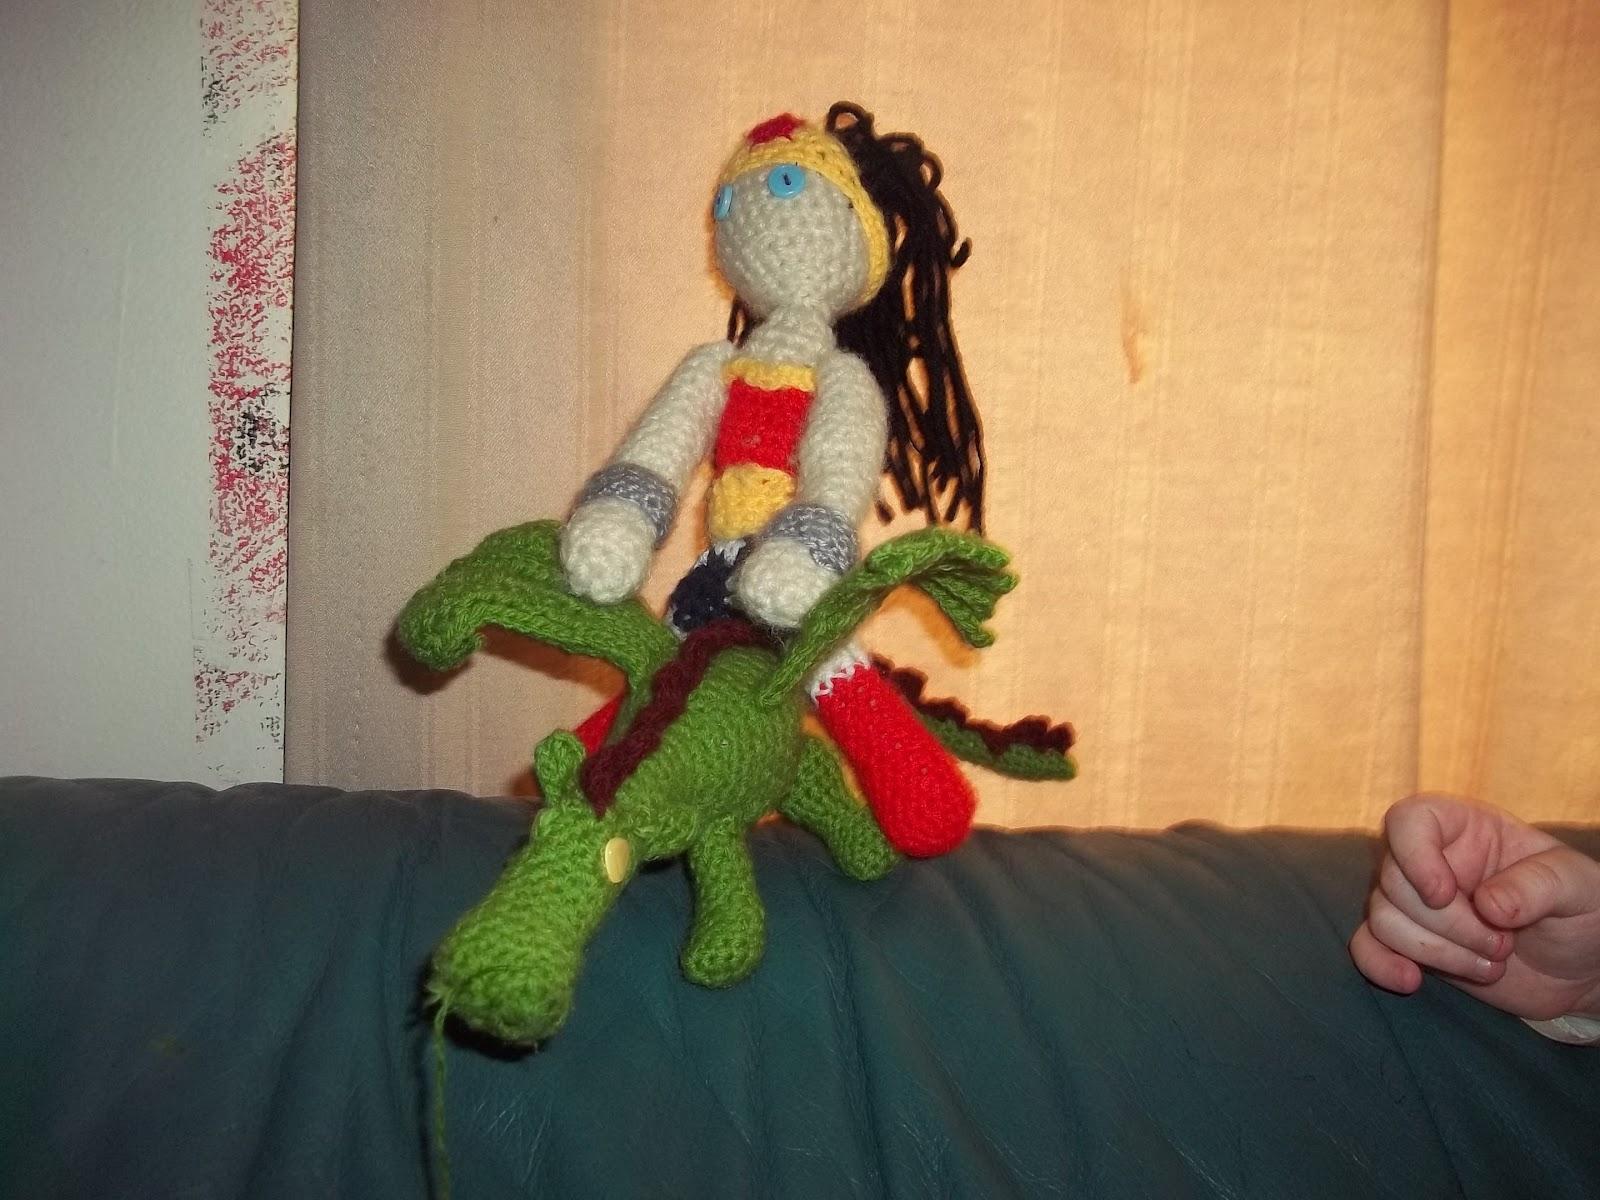 Amigurumi Wonder Woman : Mostly Crochet: Wonder woman and dragons and amigurumi oh my!